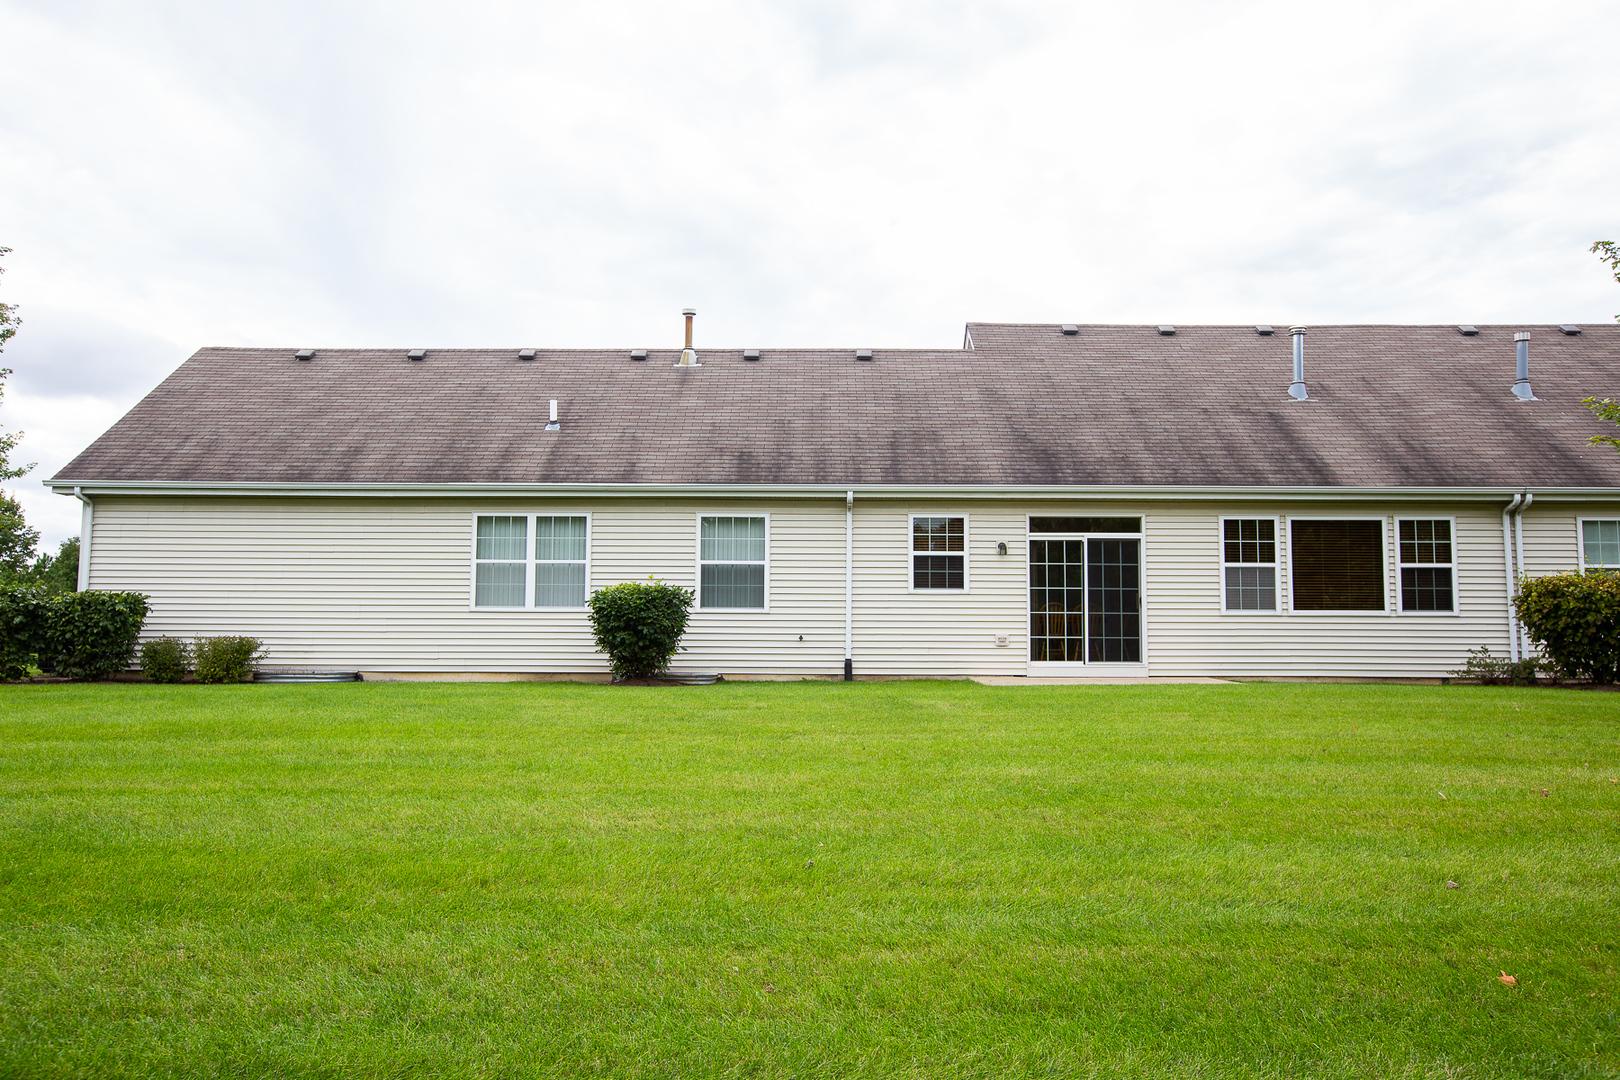 21424 Mays Lake, Crest Hill, Illinois, 60403